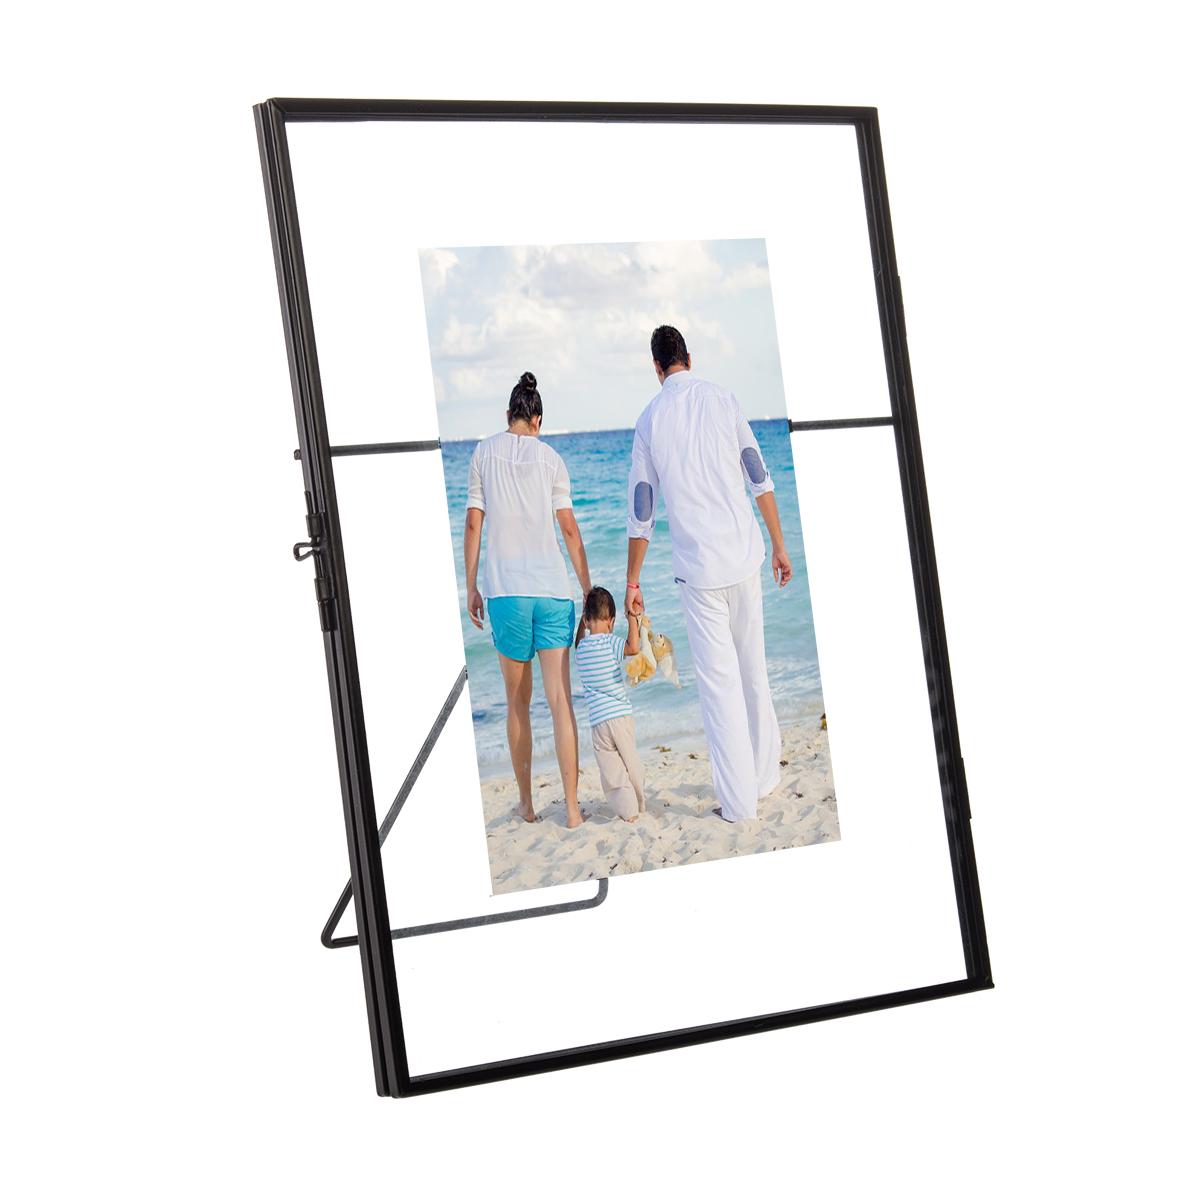 2pk floating metallic picture frames free standing glass for 5x7 2pk floating metallic picture frames free standing glass jeuxipadfo Image collections